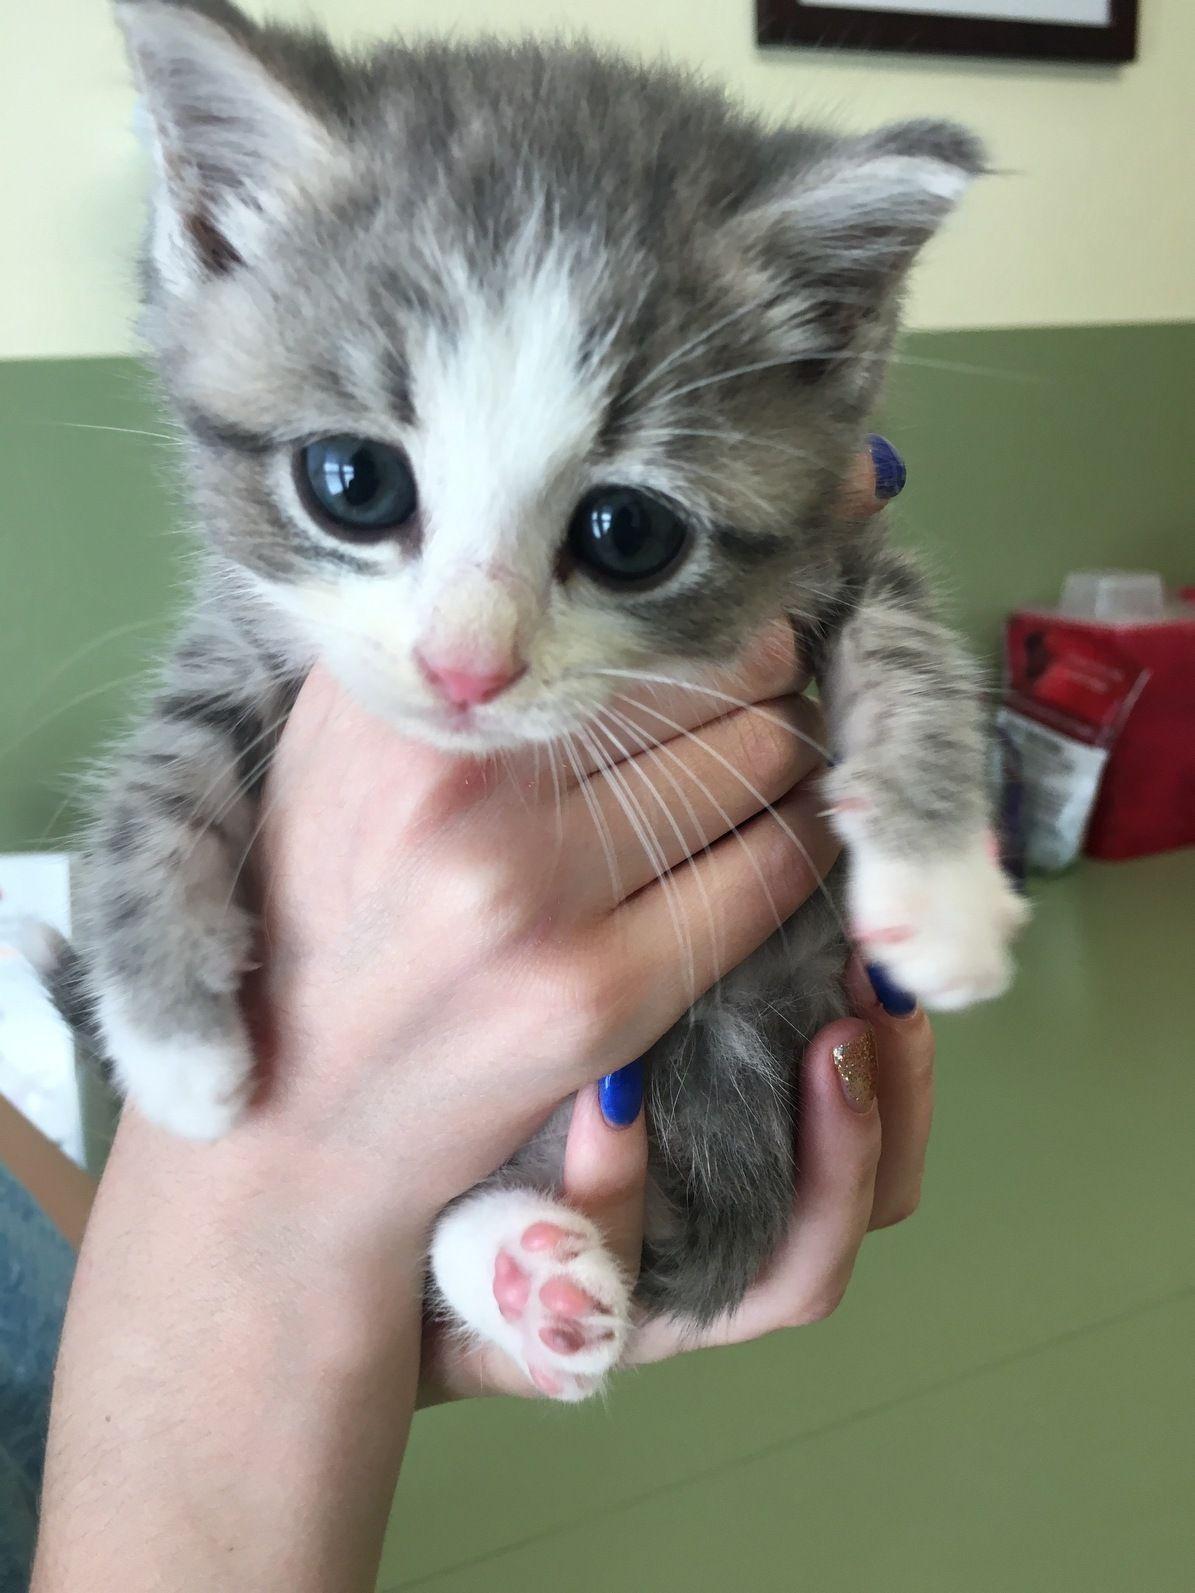 Not a Stuffed Animal, Just My Cat, Gravy Baby cats